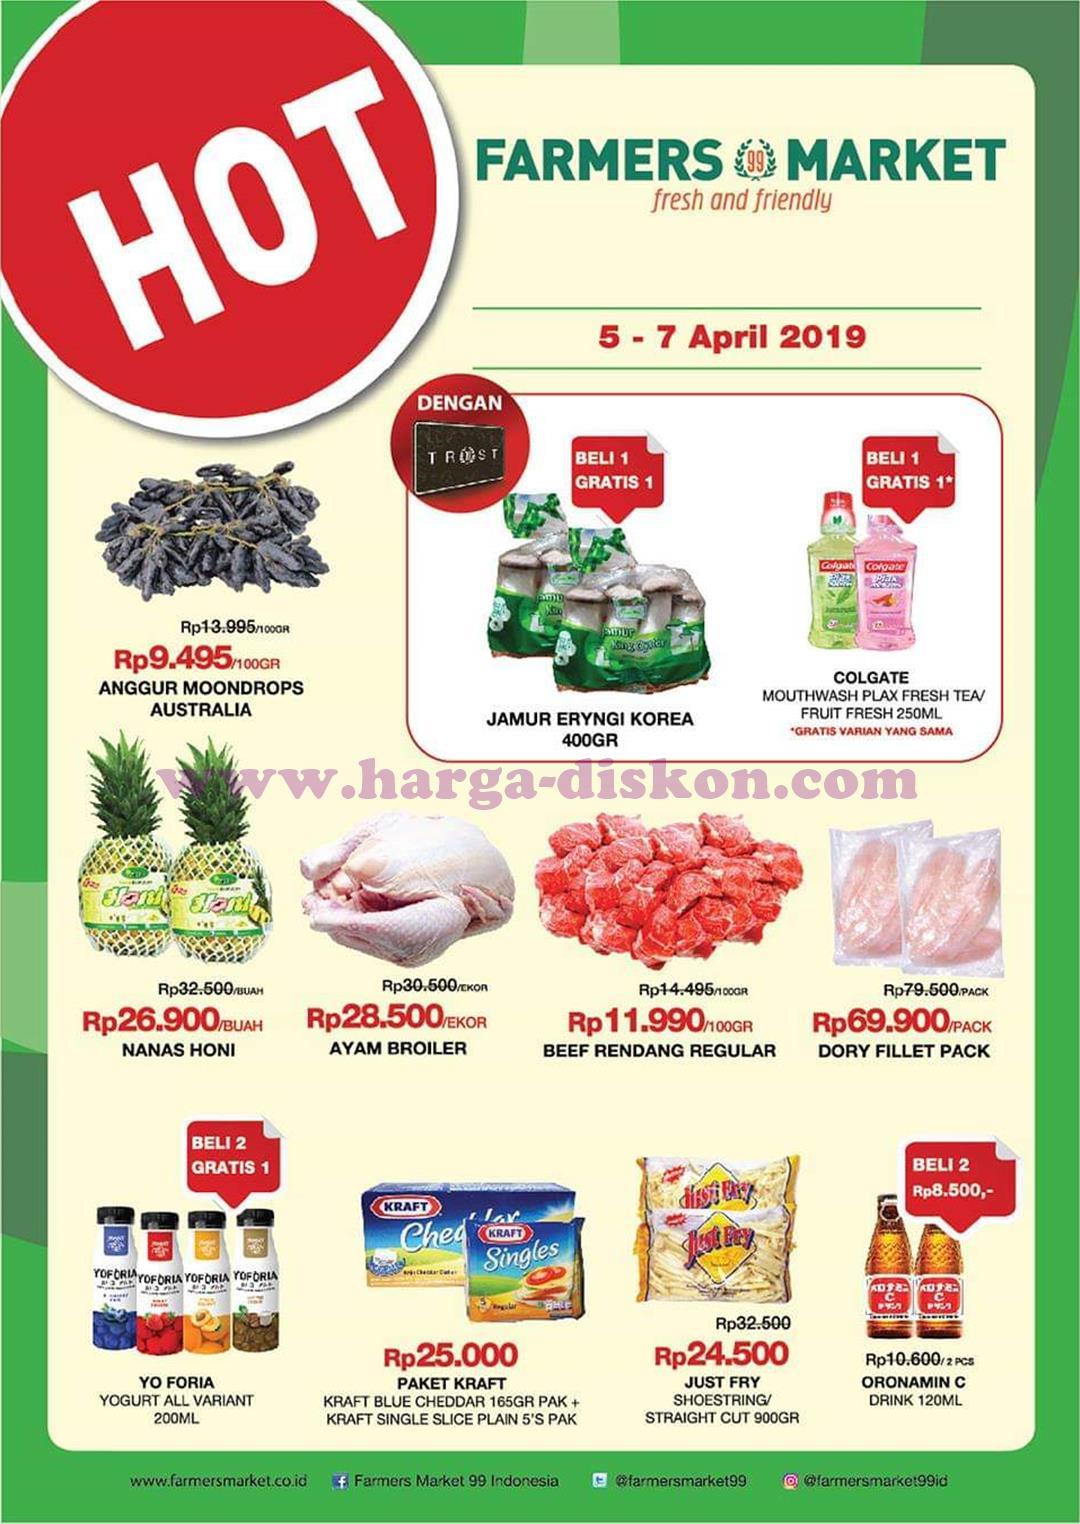 Promo Farmers Market Akhir Pekan 29 Maret 31 Maret 2019 News And Talking